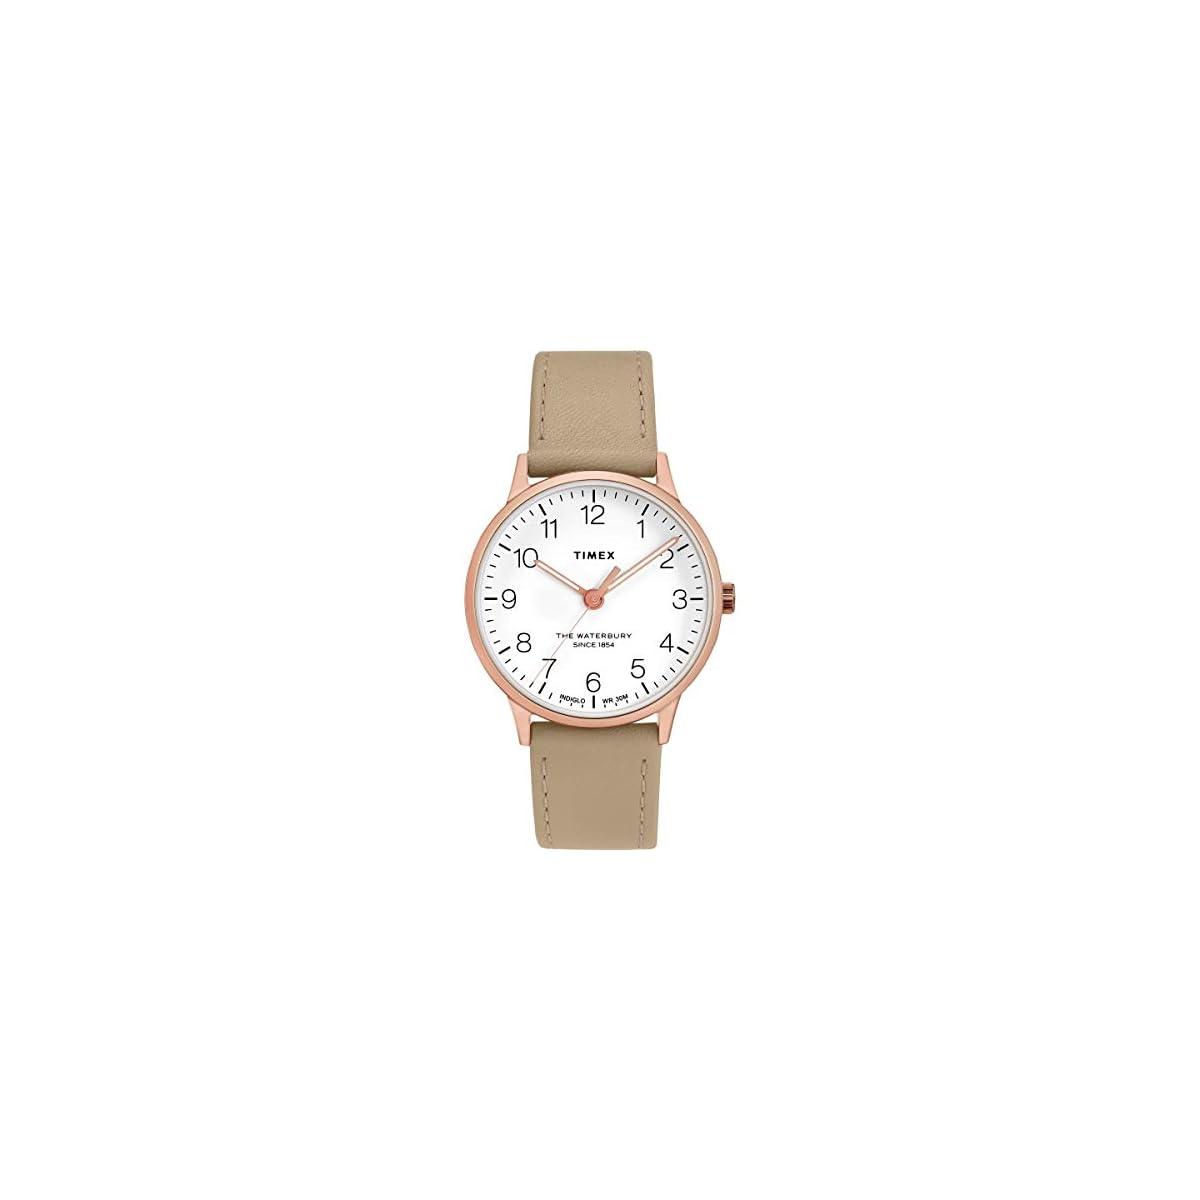 41wPEuul3cL. SS1200  - Reloj - Timex - para - TW2T27000